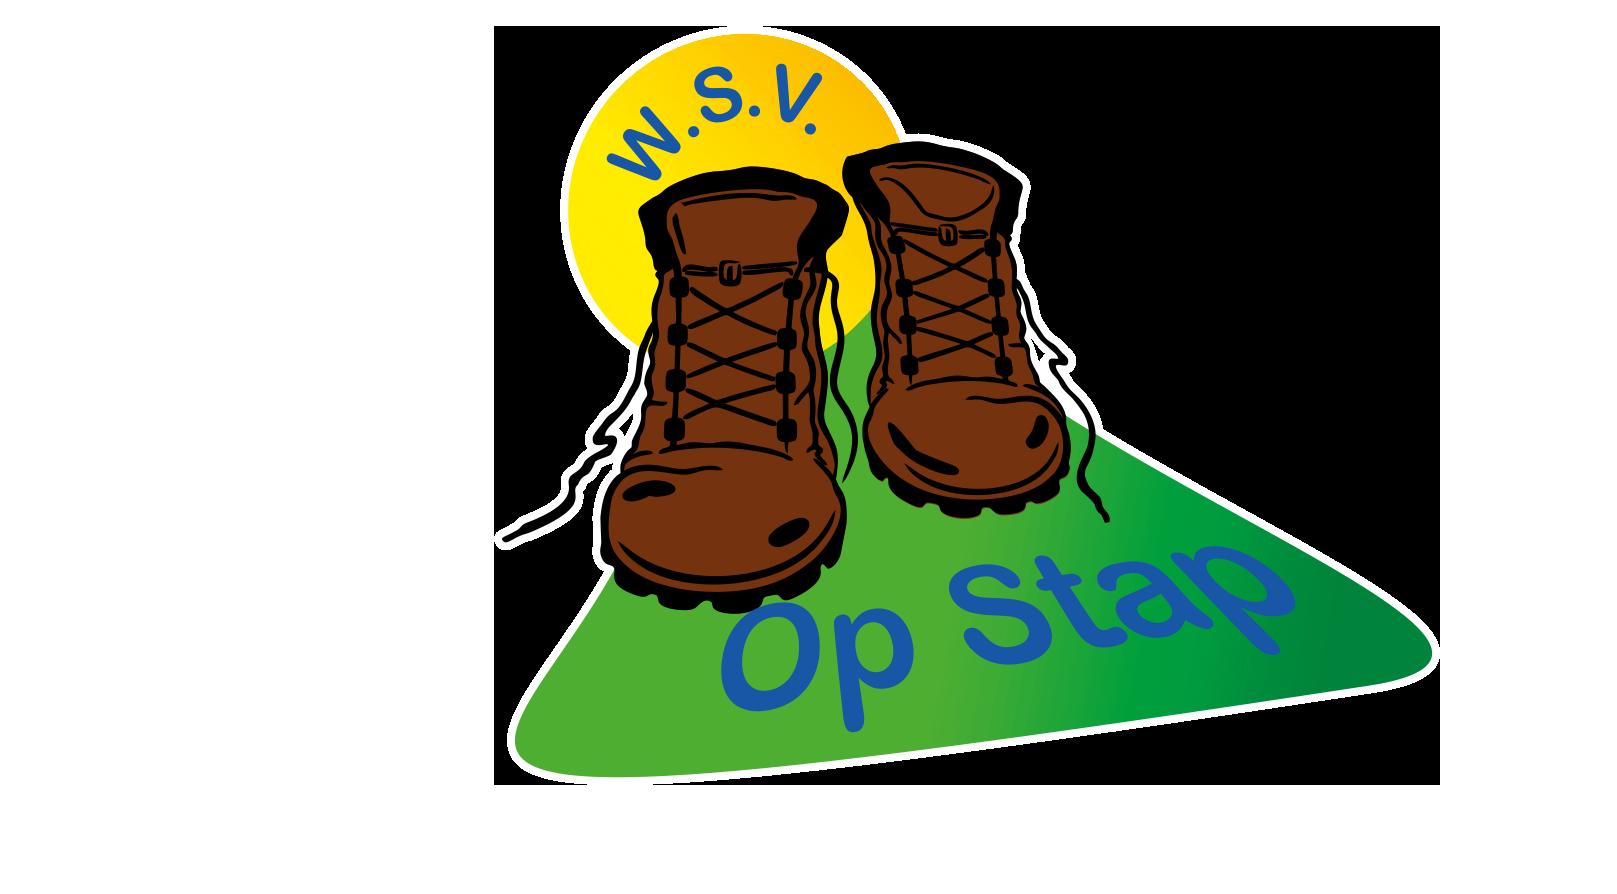 WSV Op stap